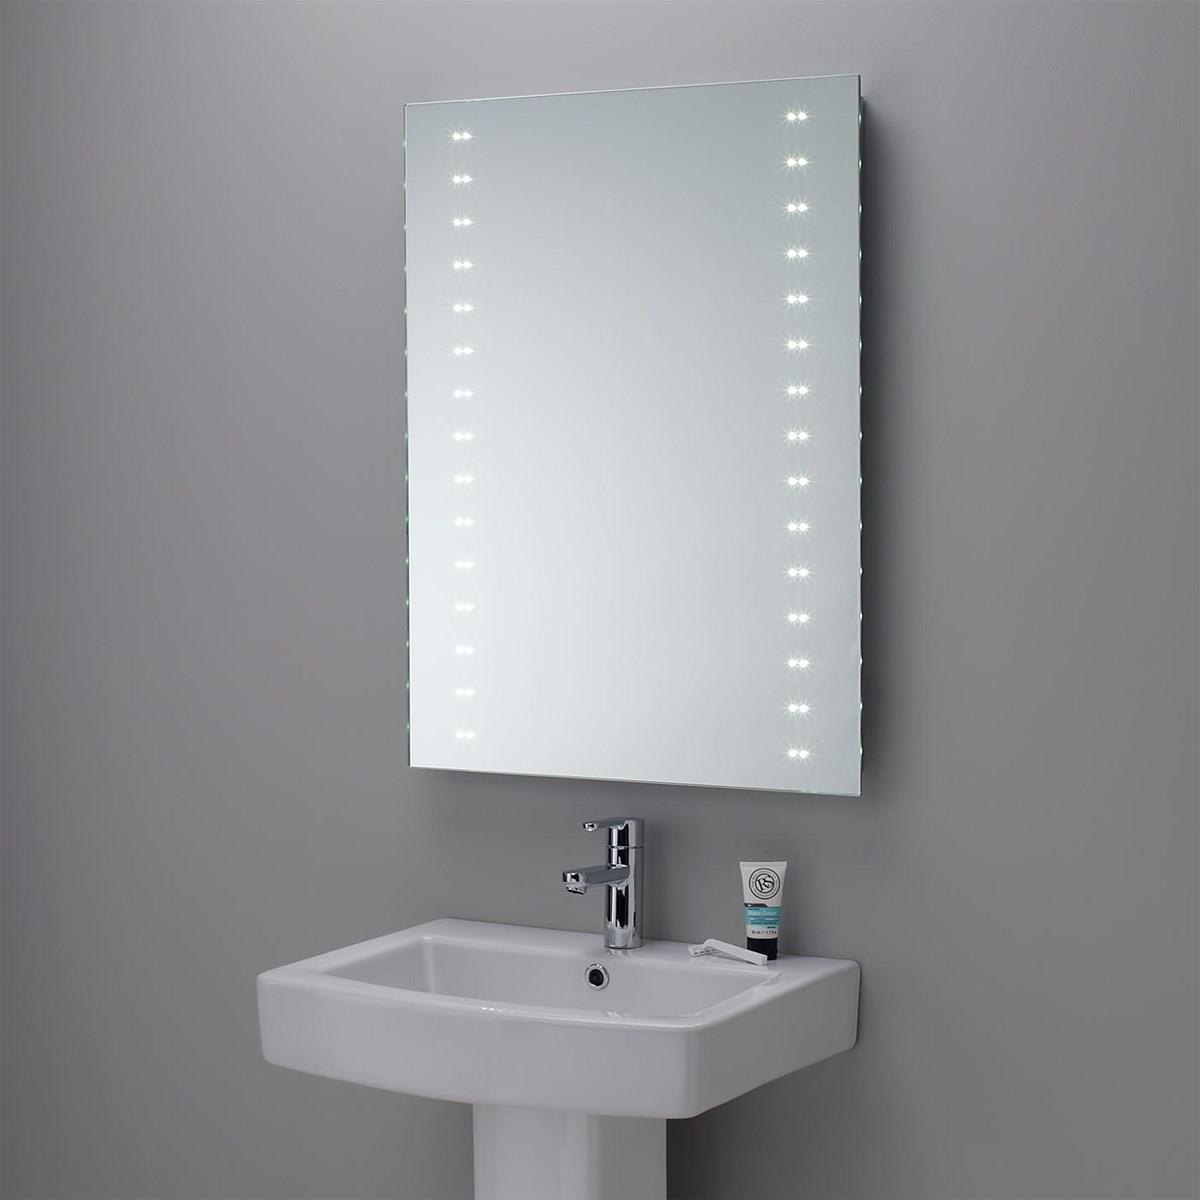 Modern Hotel LED Illuminated Backlit Bathroom Mirror purchasing ...